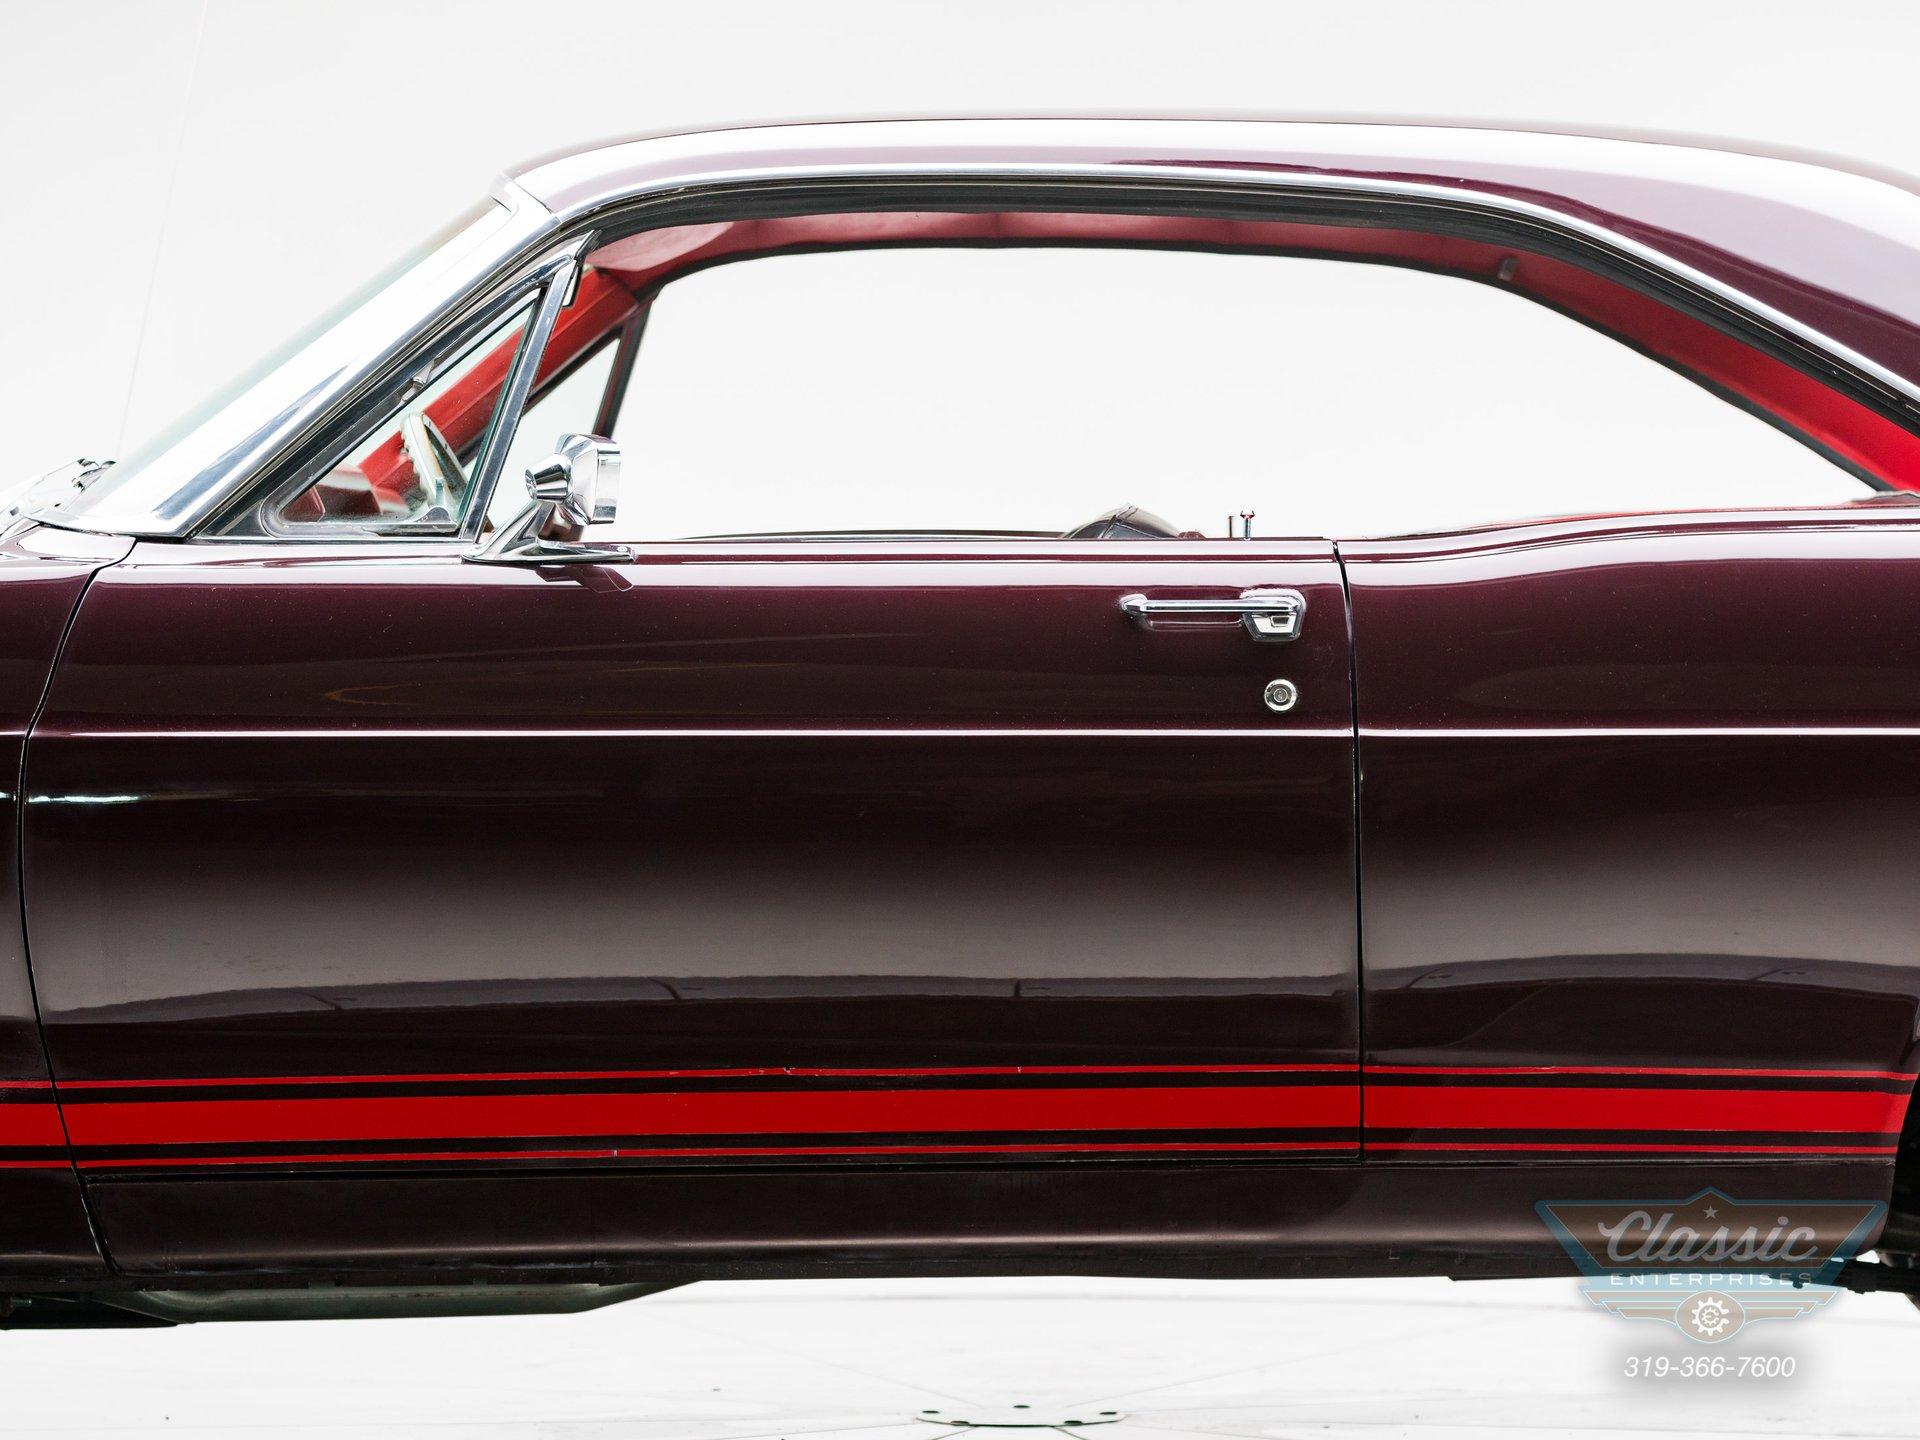 1967 Ford Fairlane GTA for sale #36680 | MCG